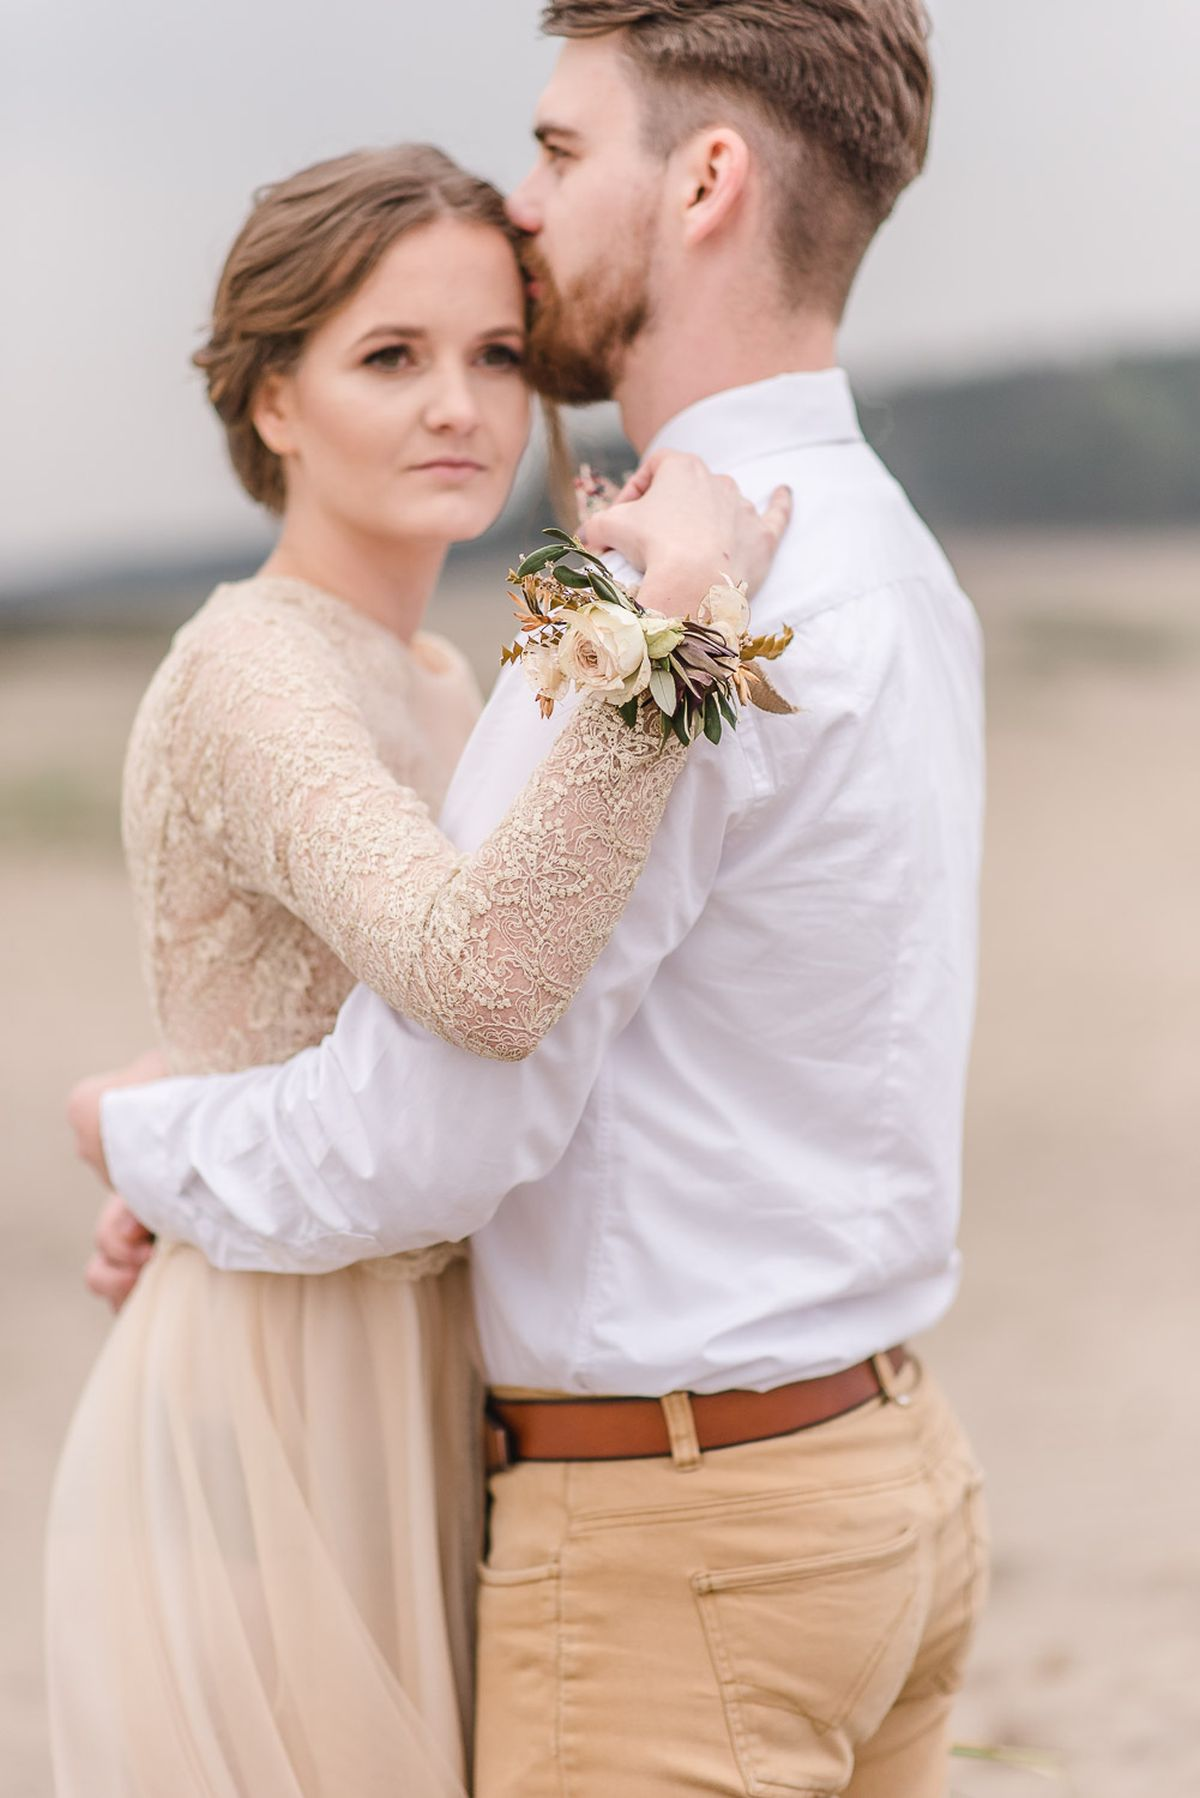 aschaaa-photography-wedding-shoot-wüste (14)